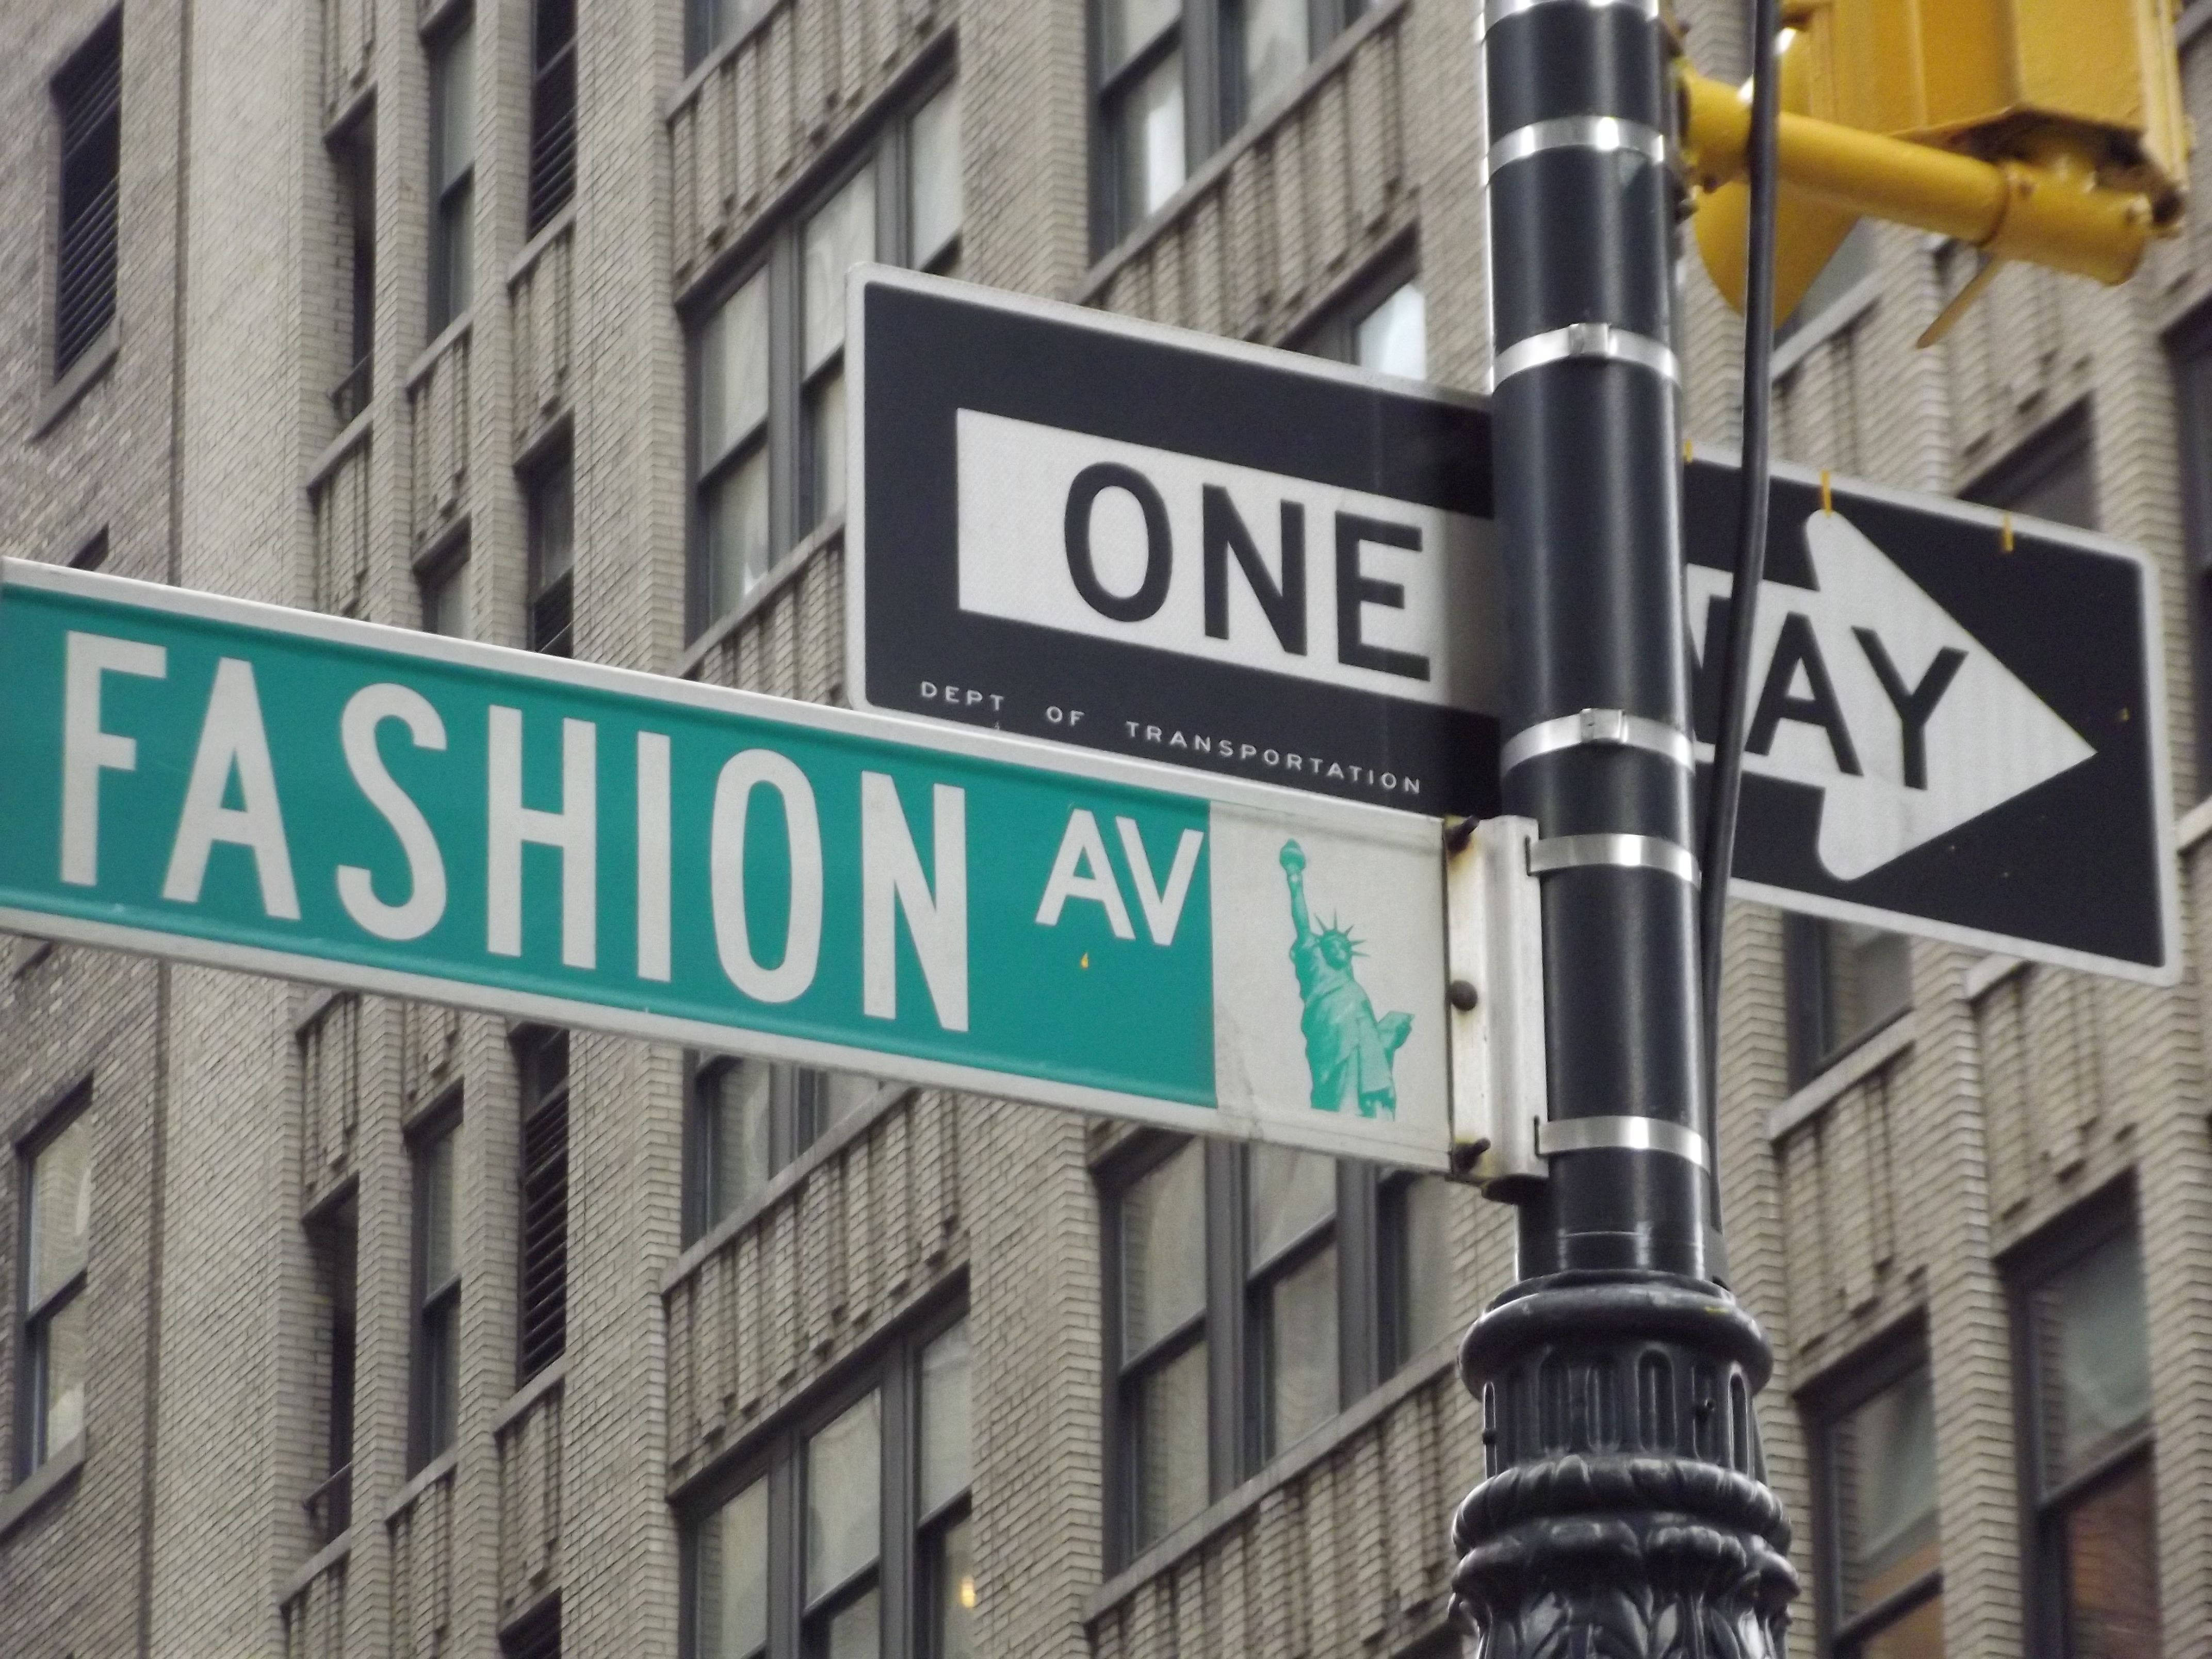 Fashion avenue street sign 83